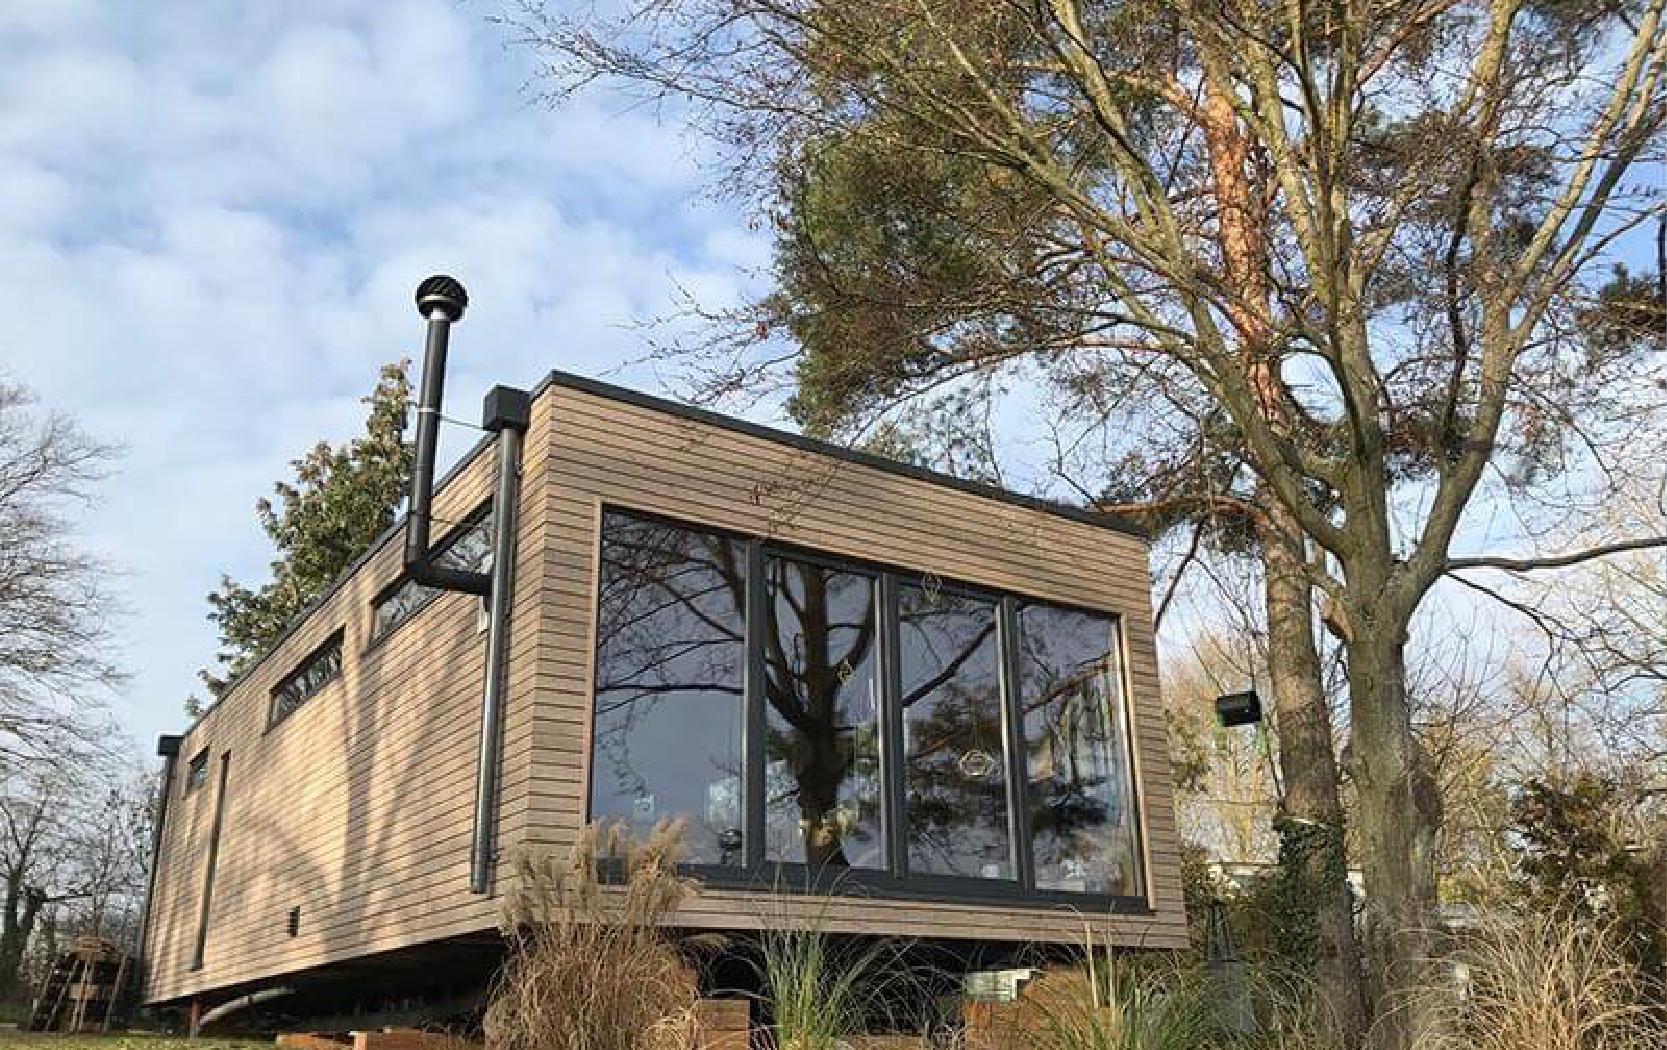 mobiles-chalet-norwegen-mobiles-tiny-house